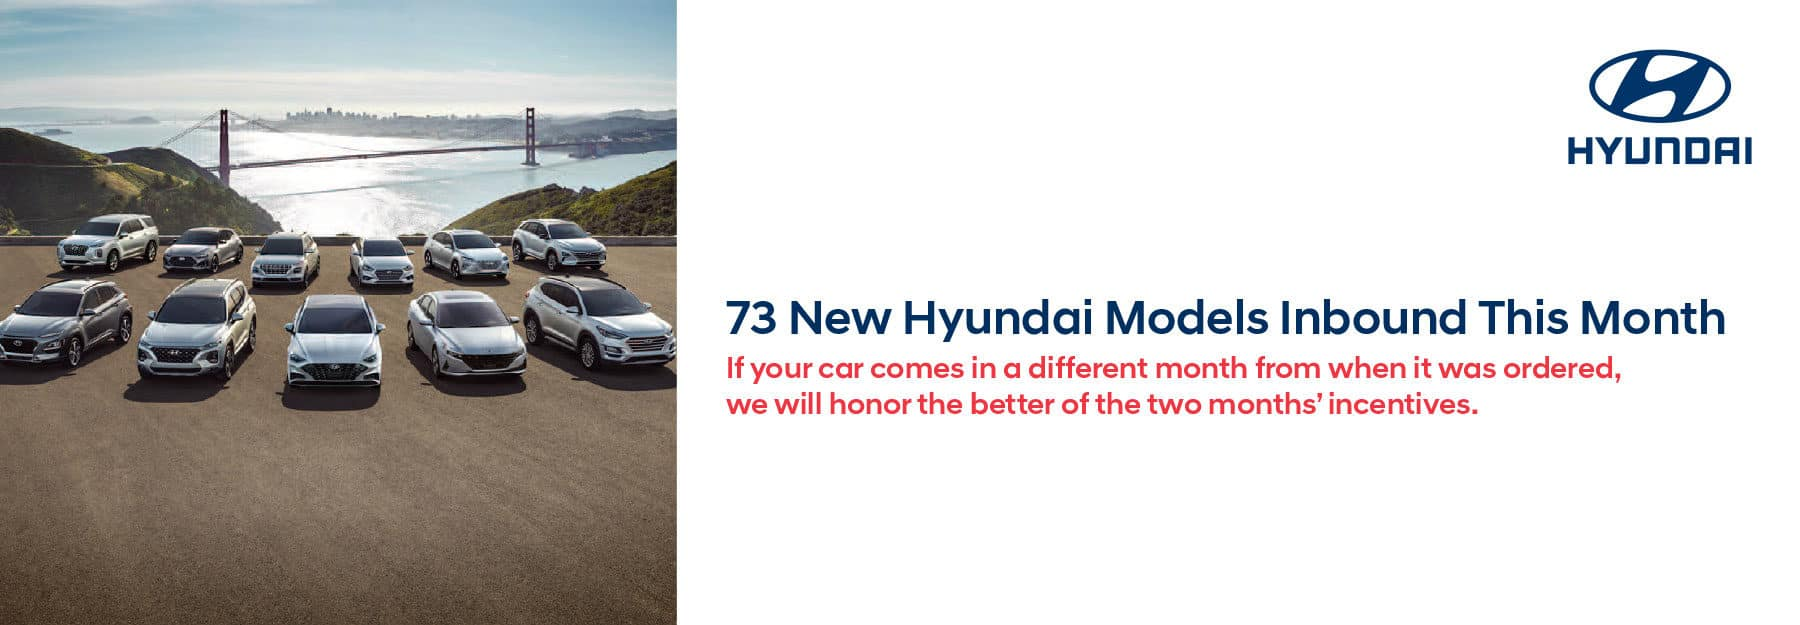 2021-september-hyundai-new-models-2